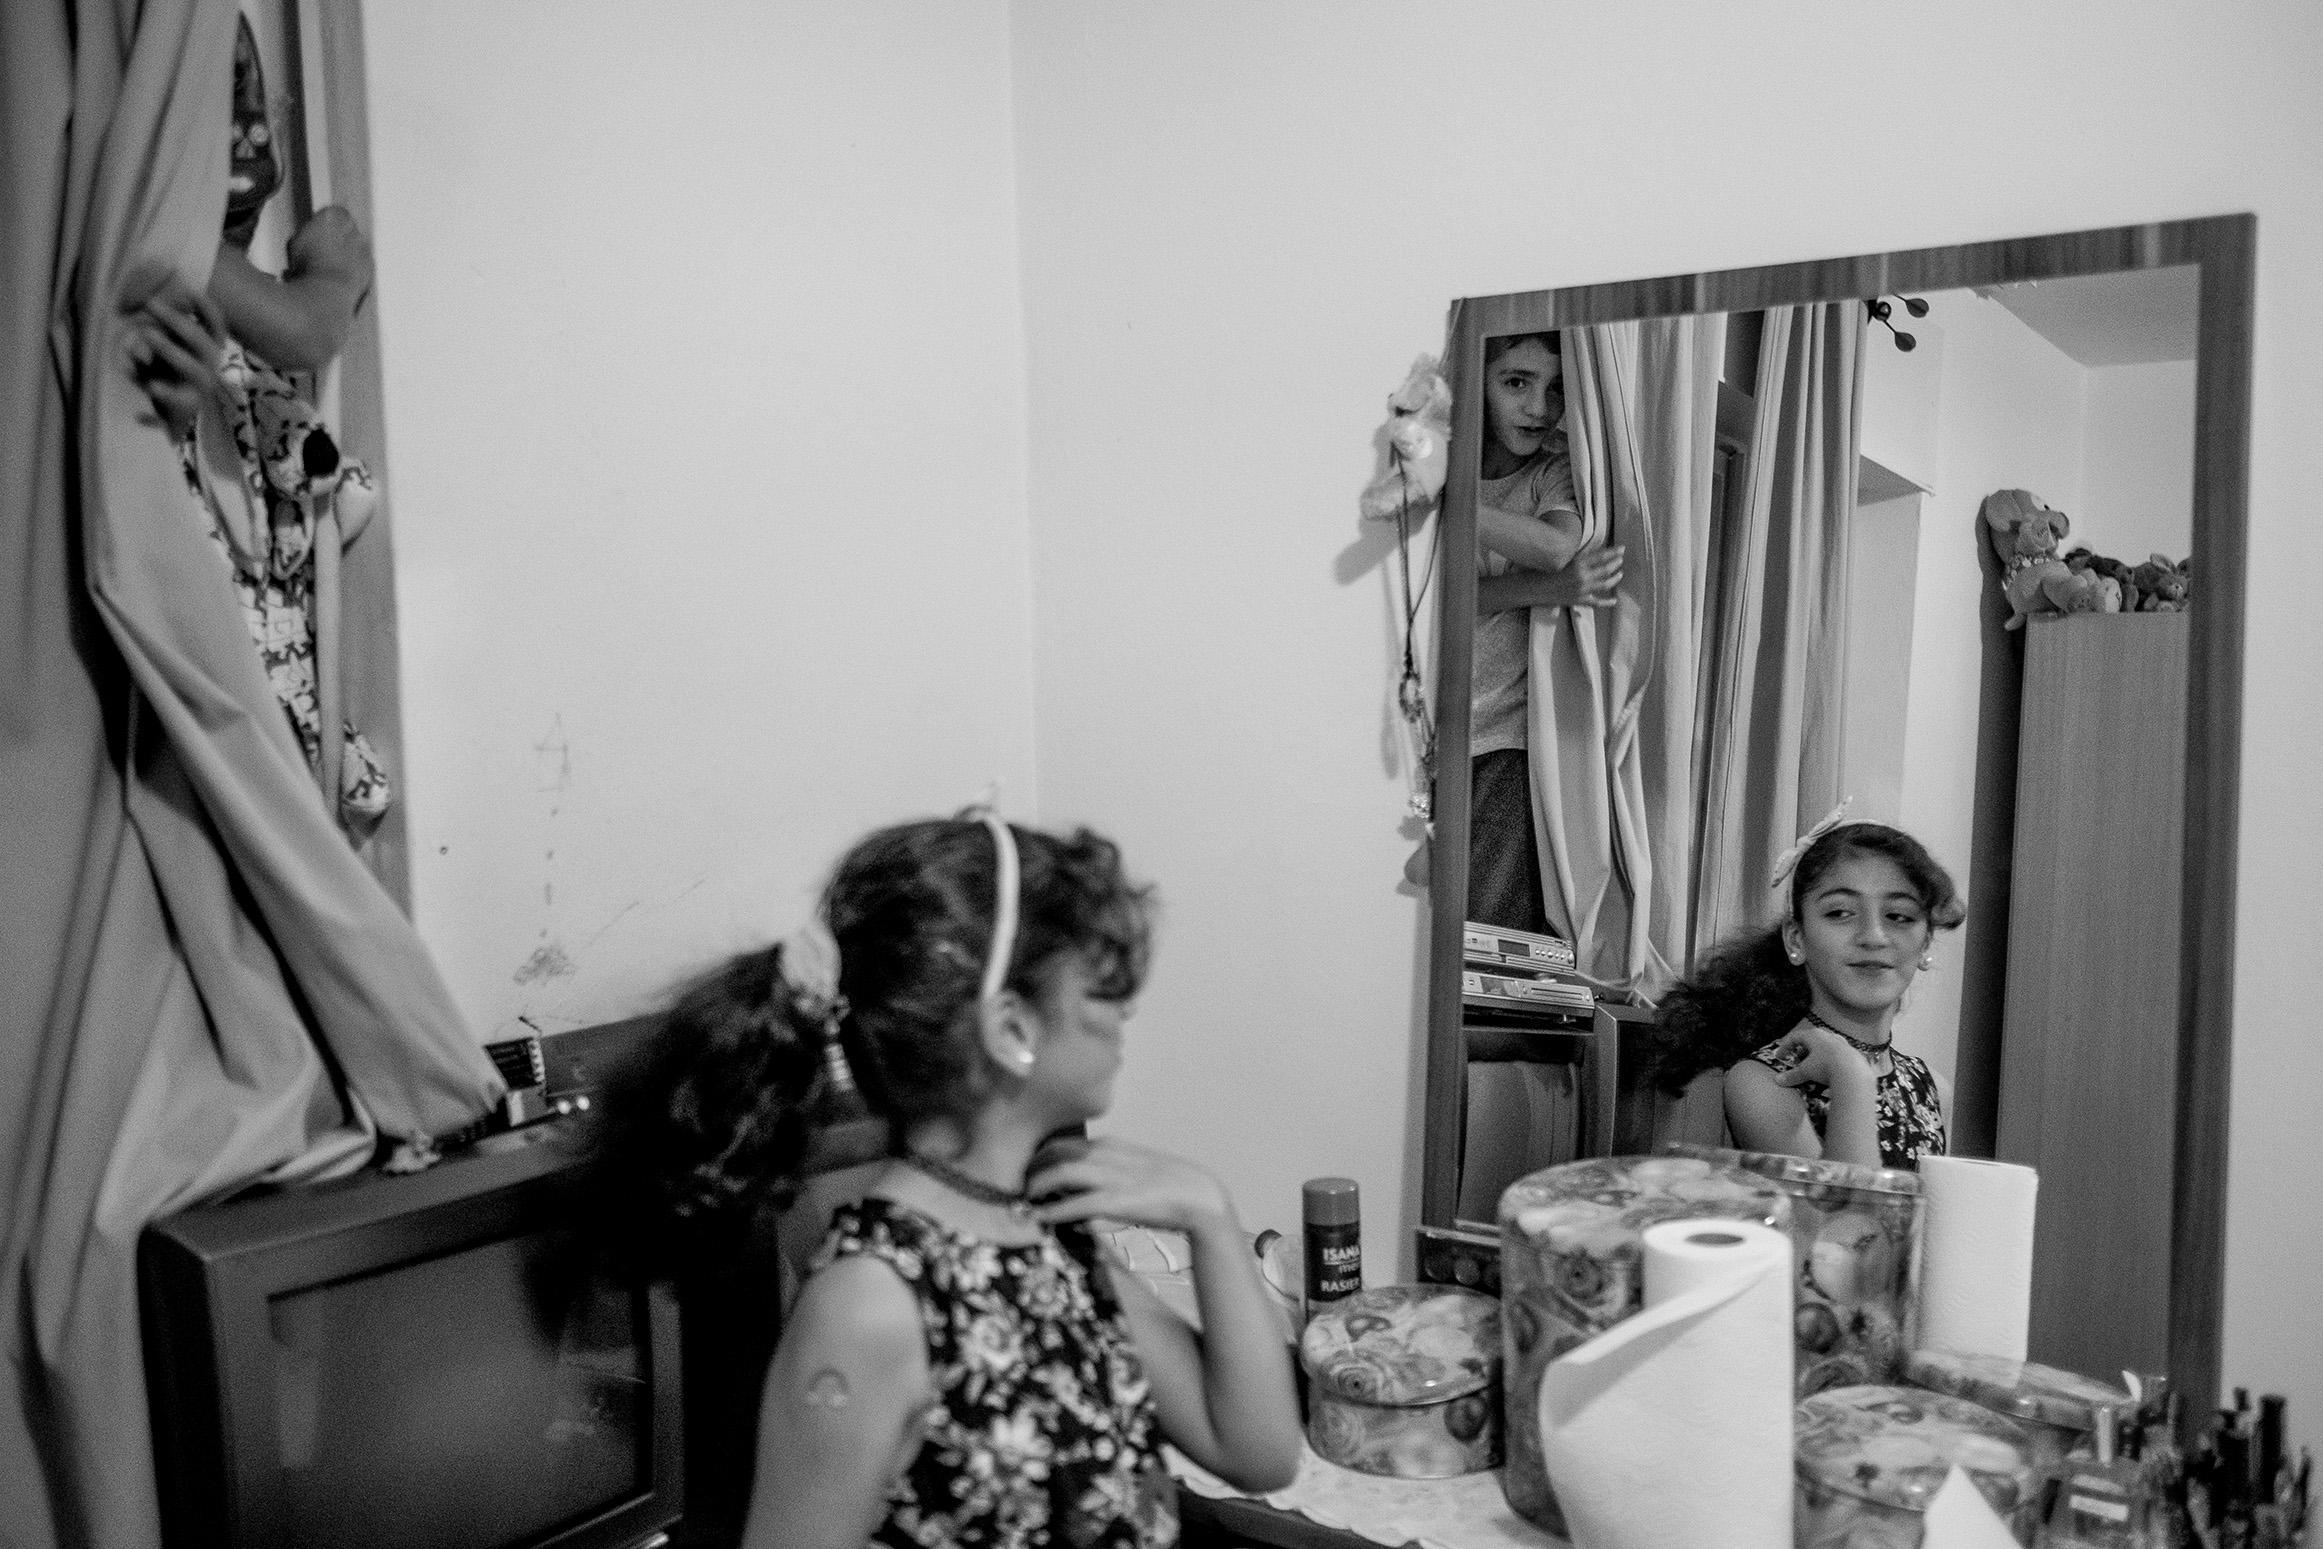 fluechtlinge-syrien-berlin-asyl-integration-spiegel